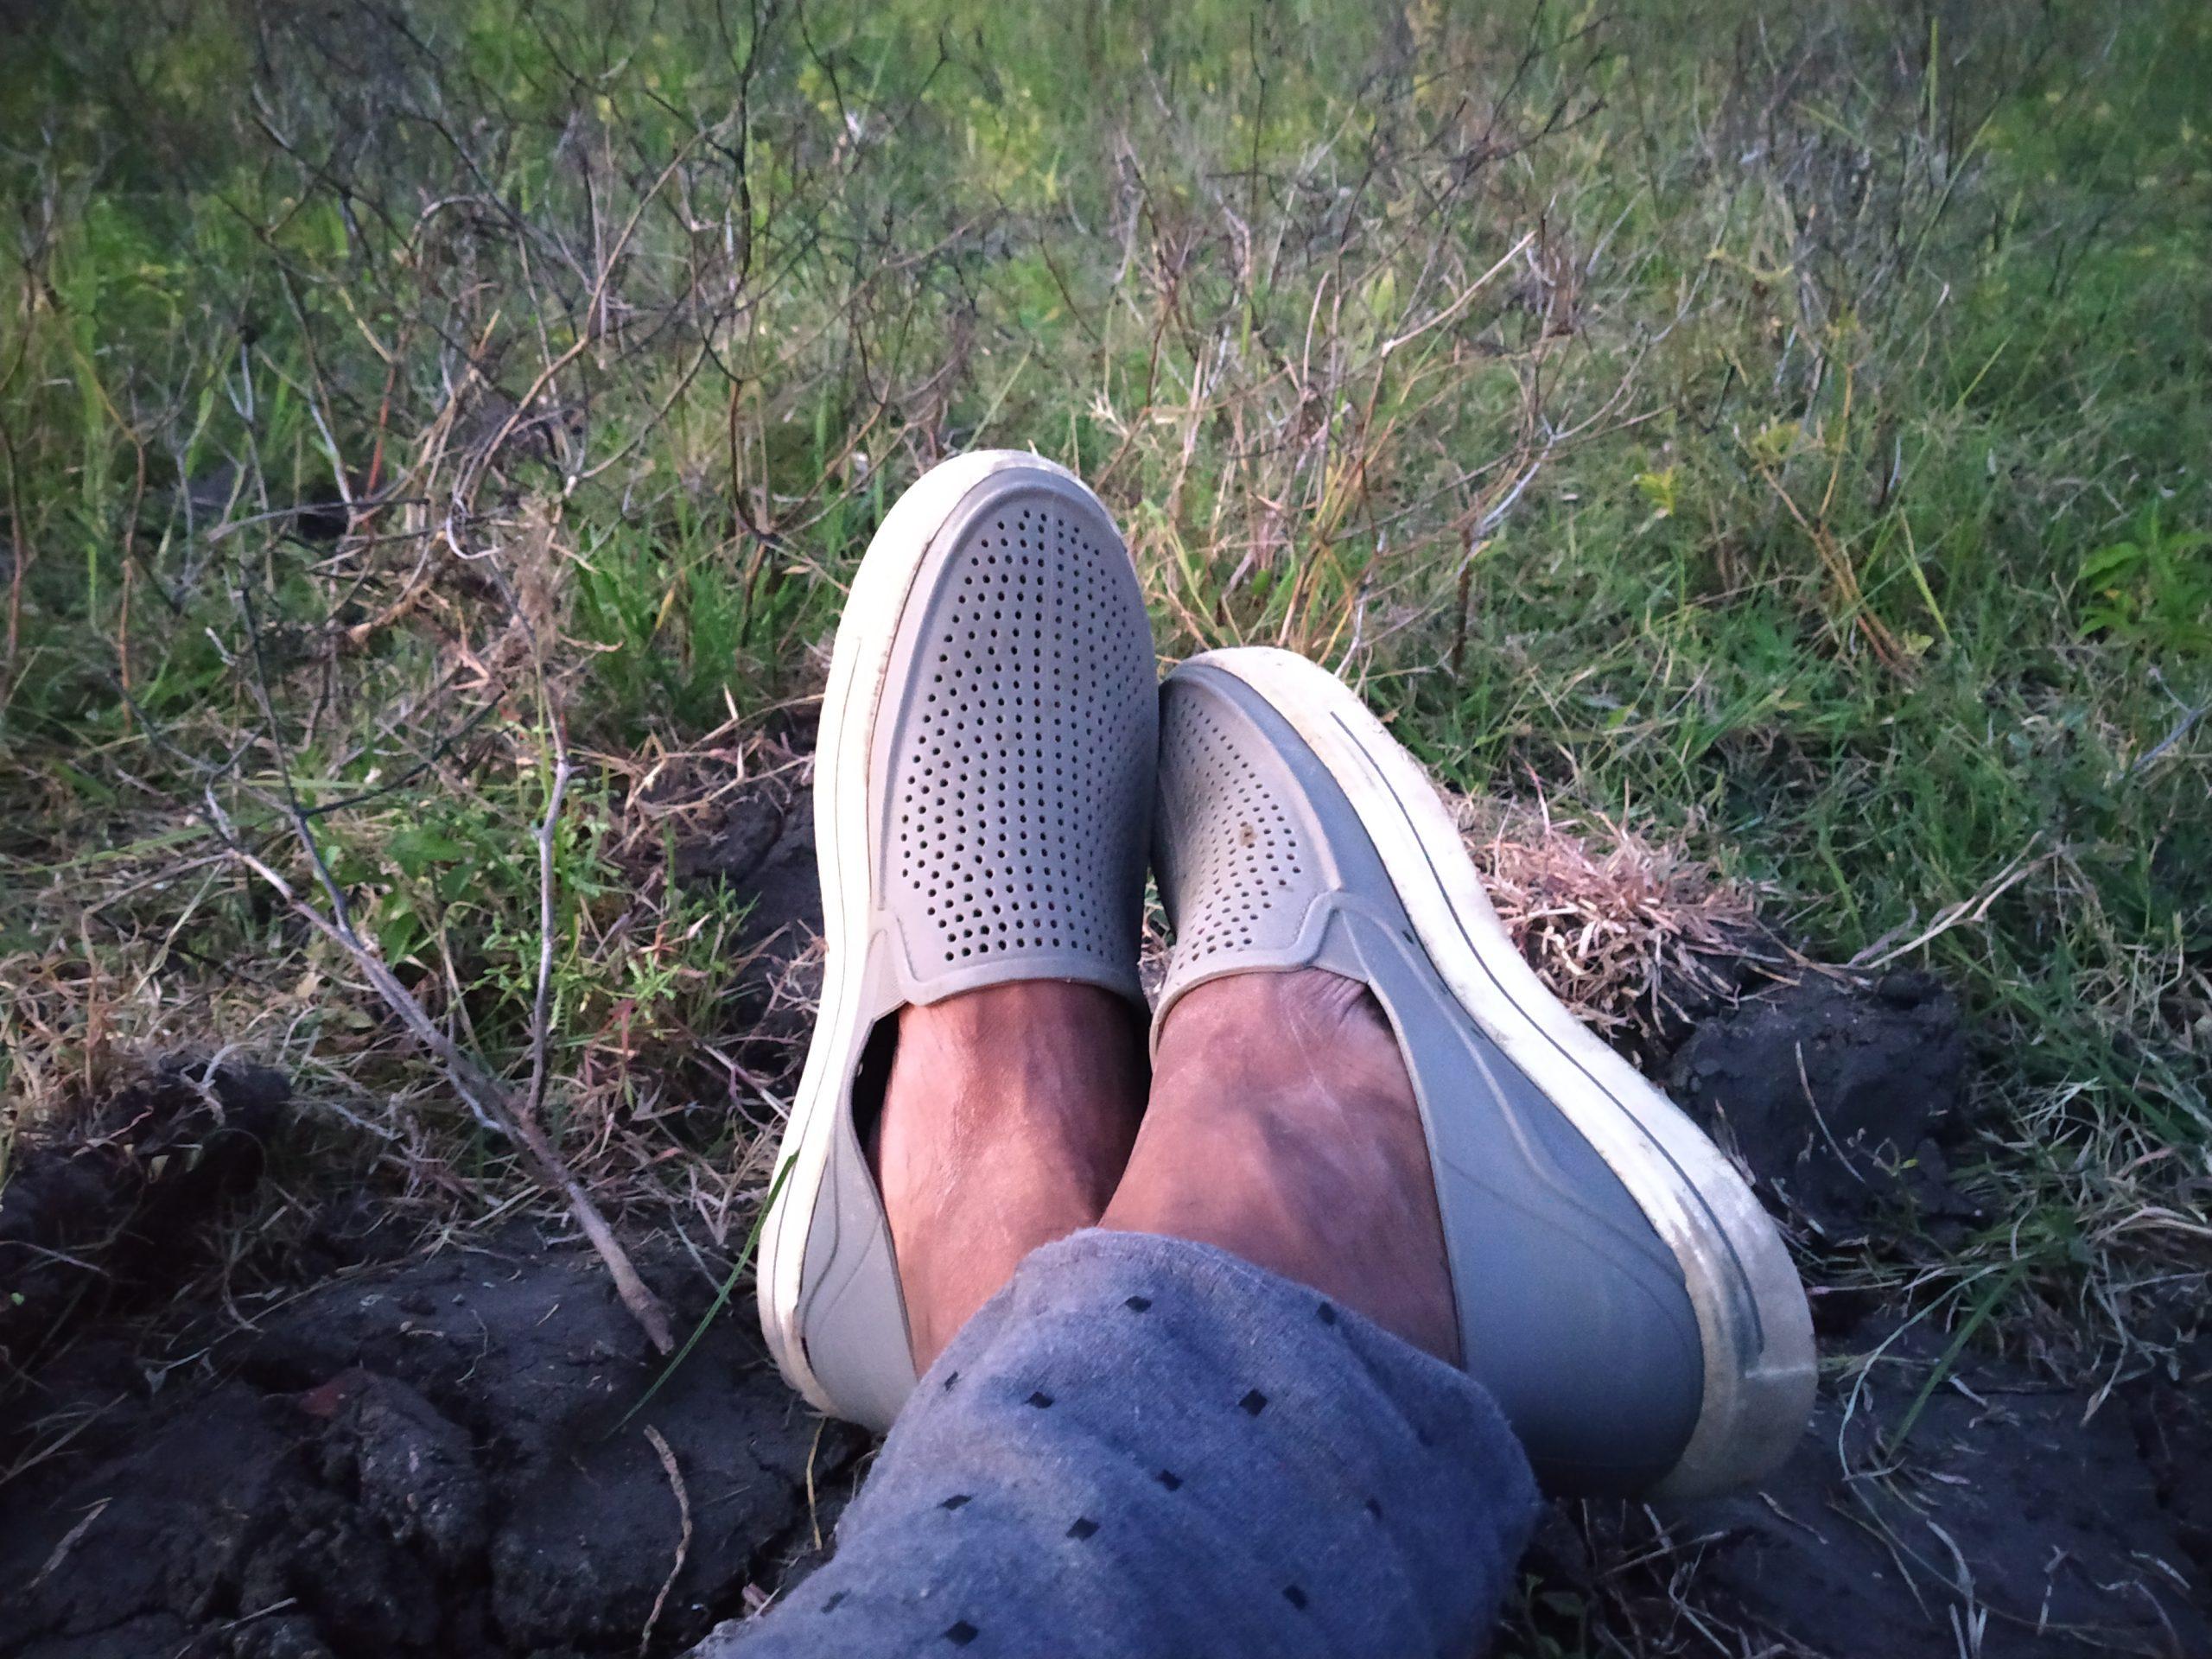 Resting legs in nature